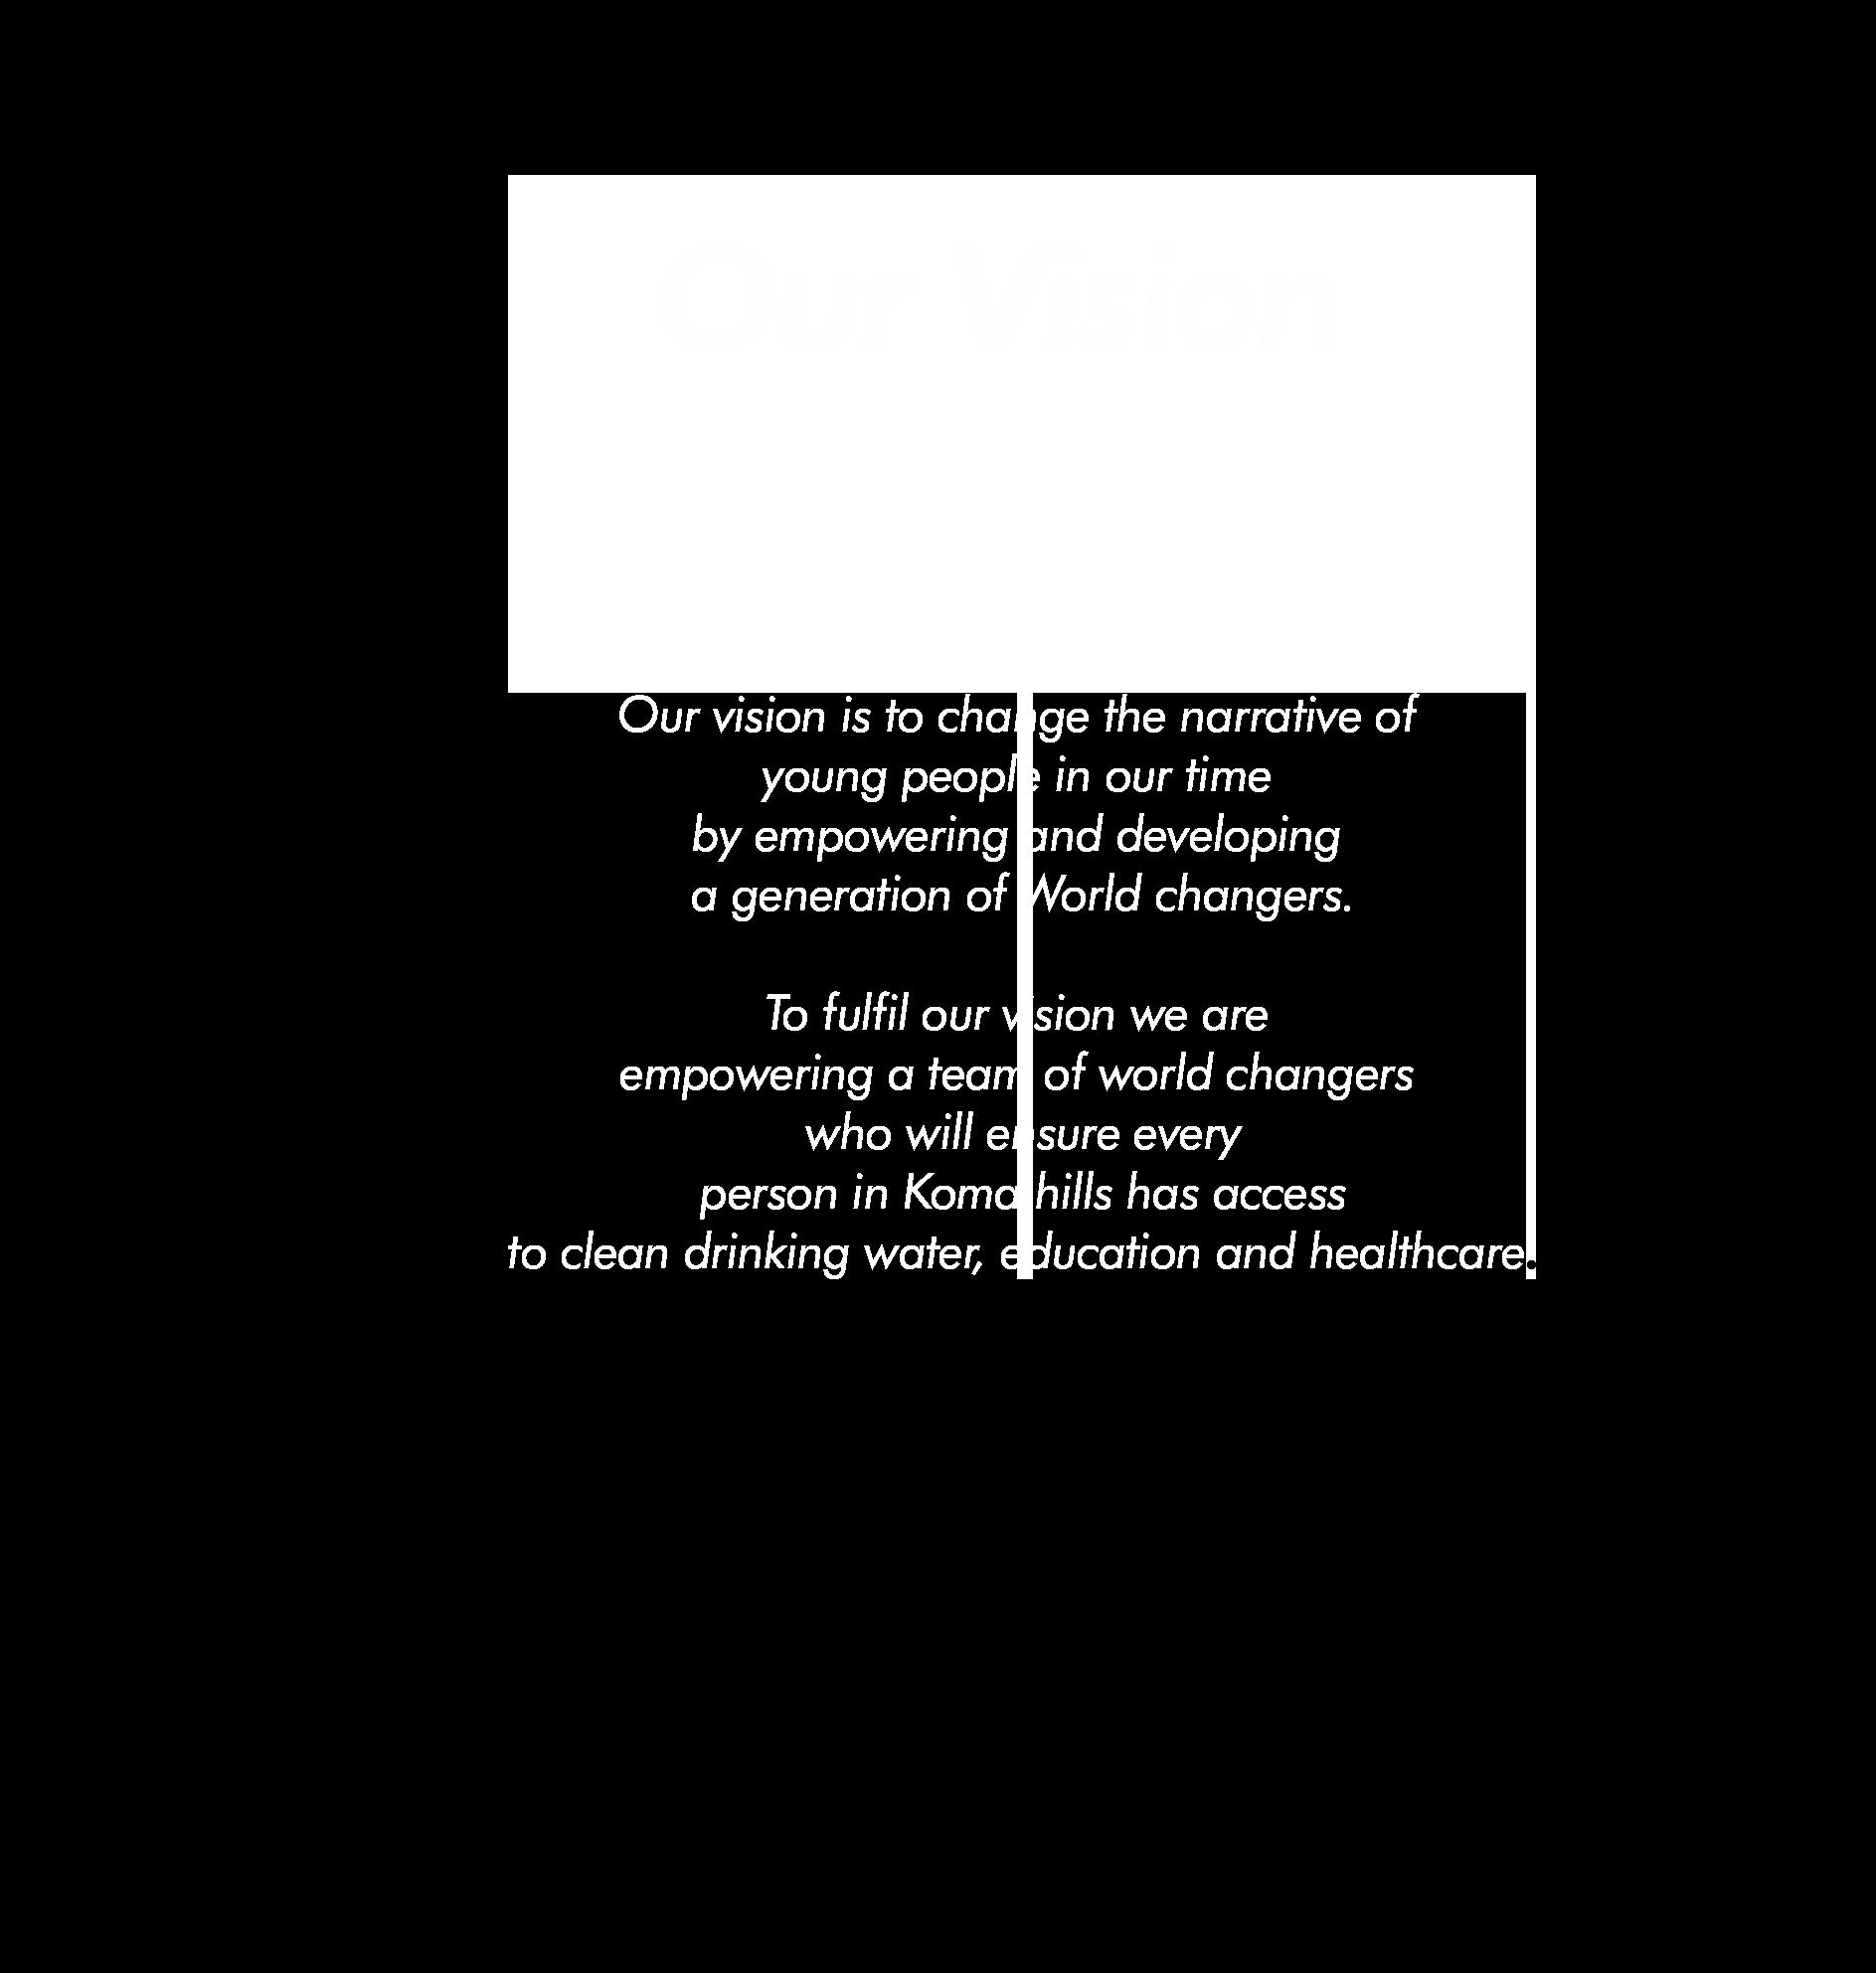 visionssss.jpg